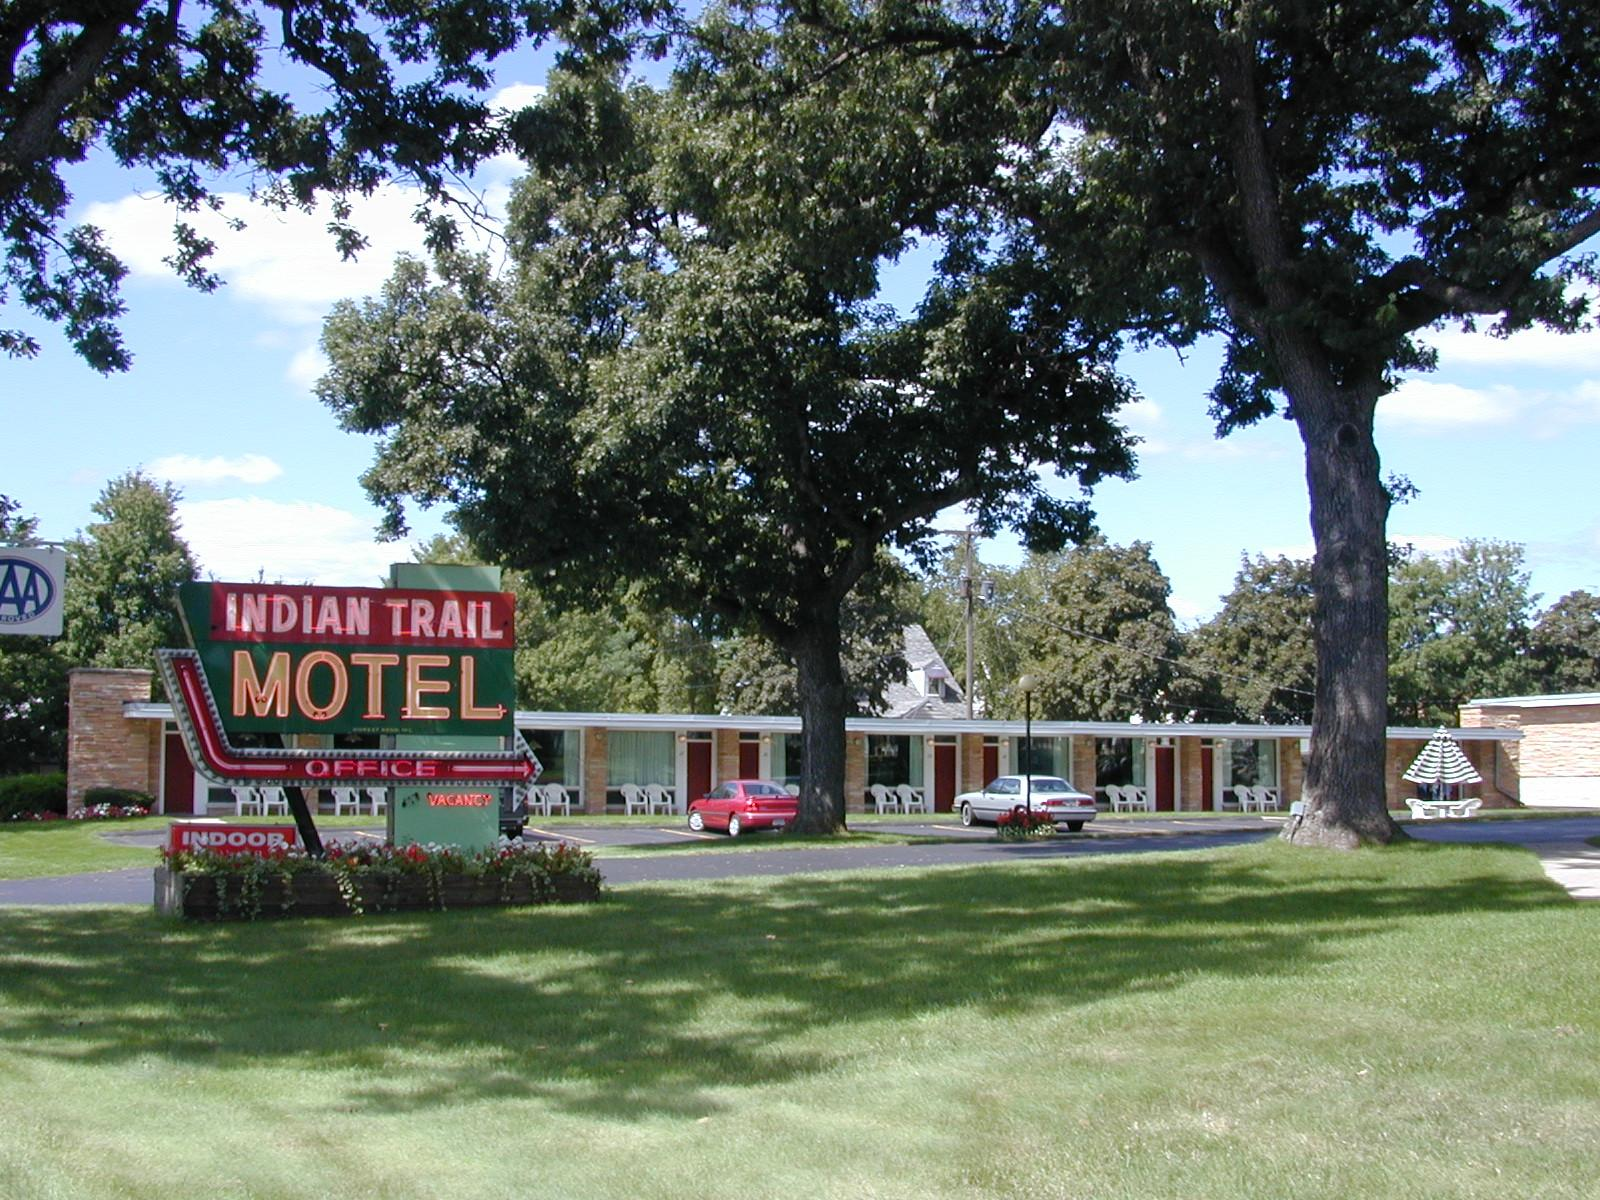 Indian Trail Motel